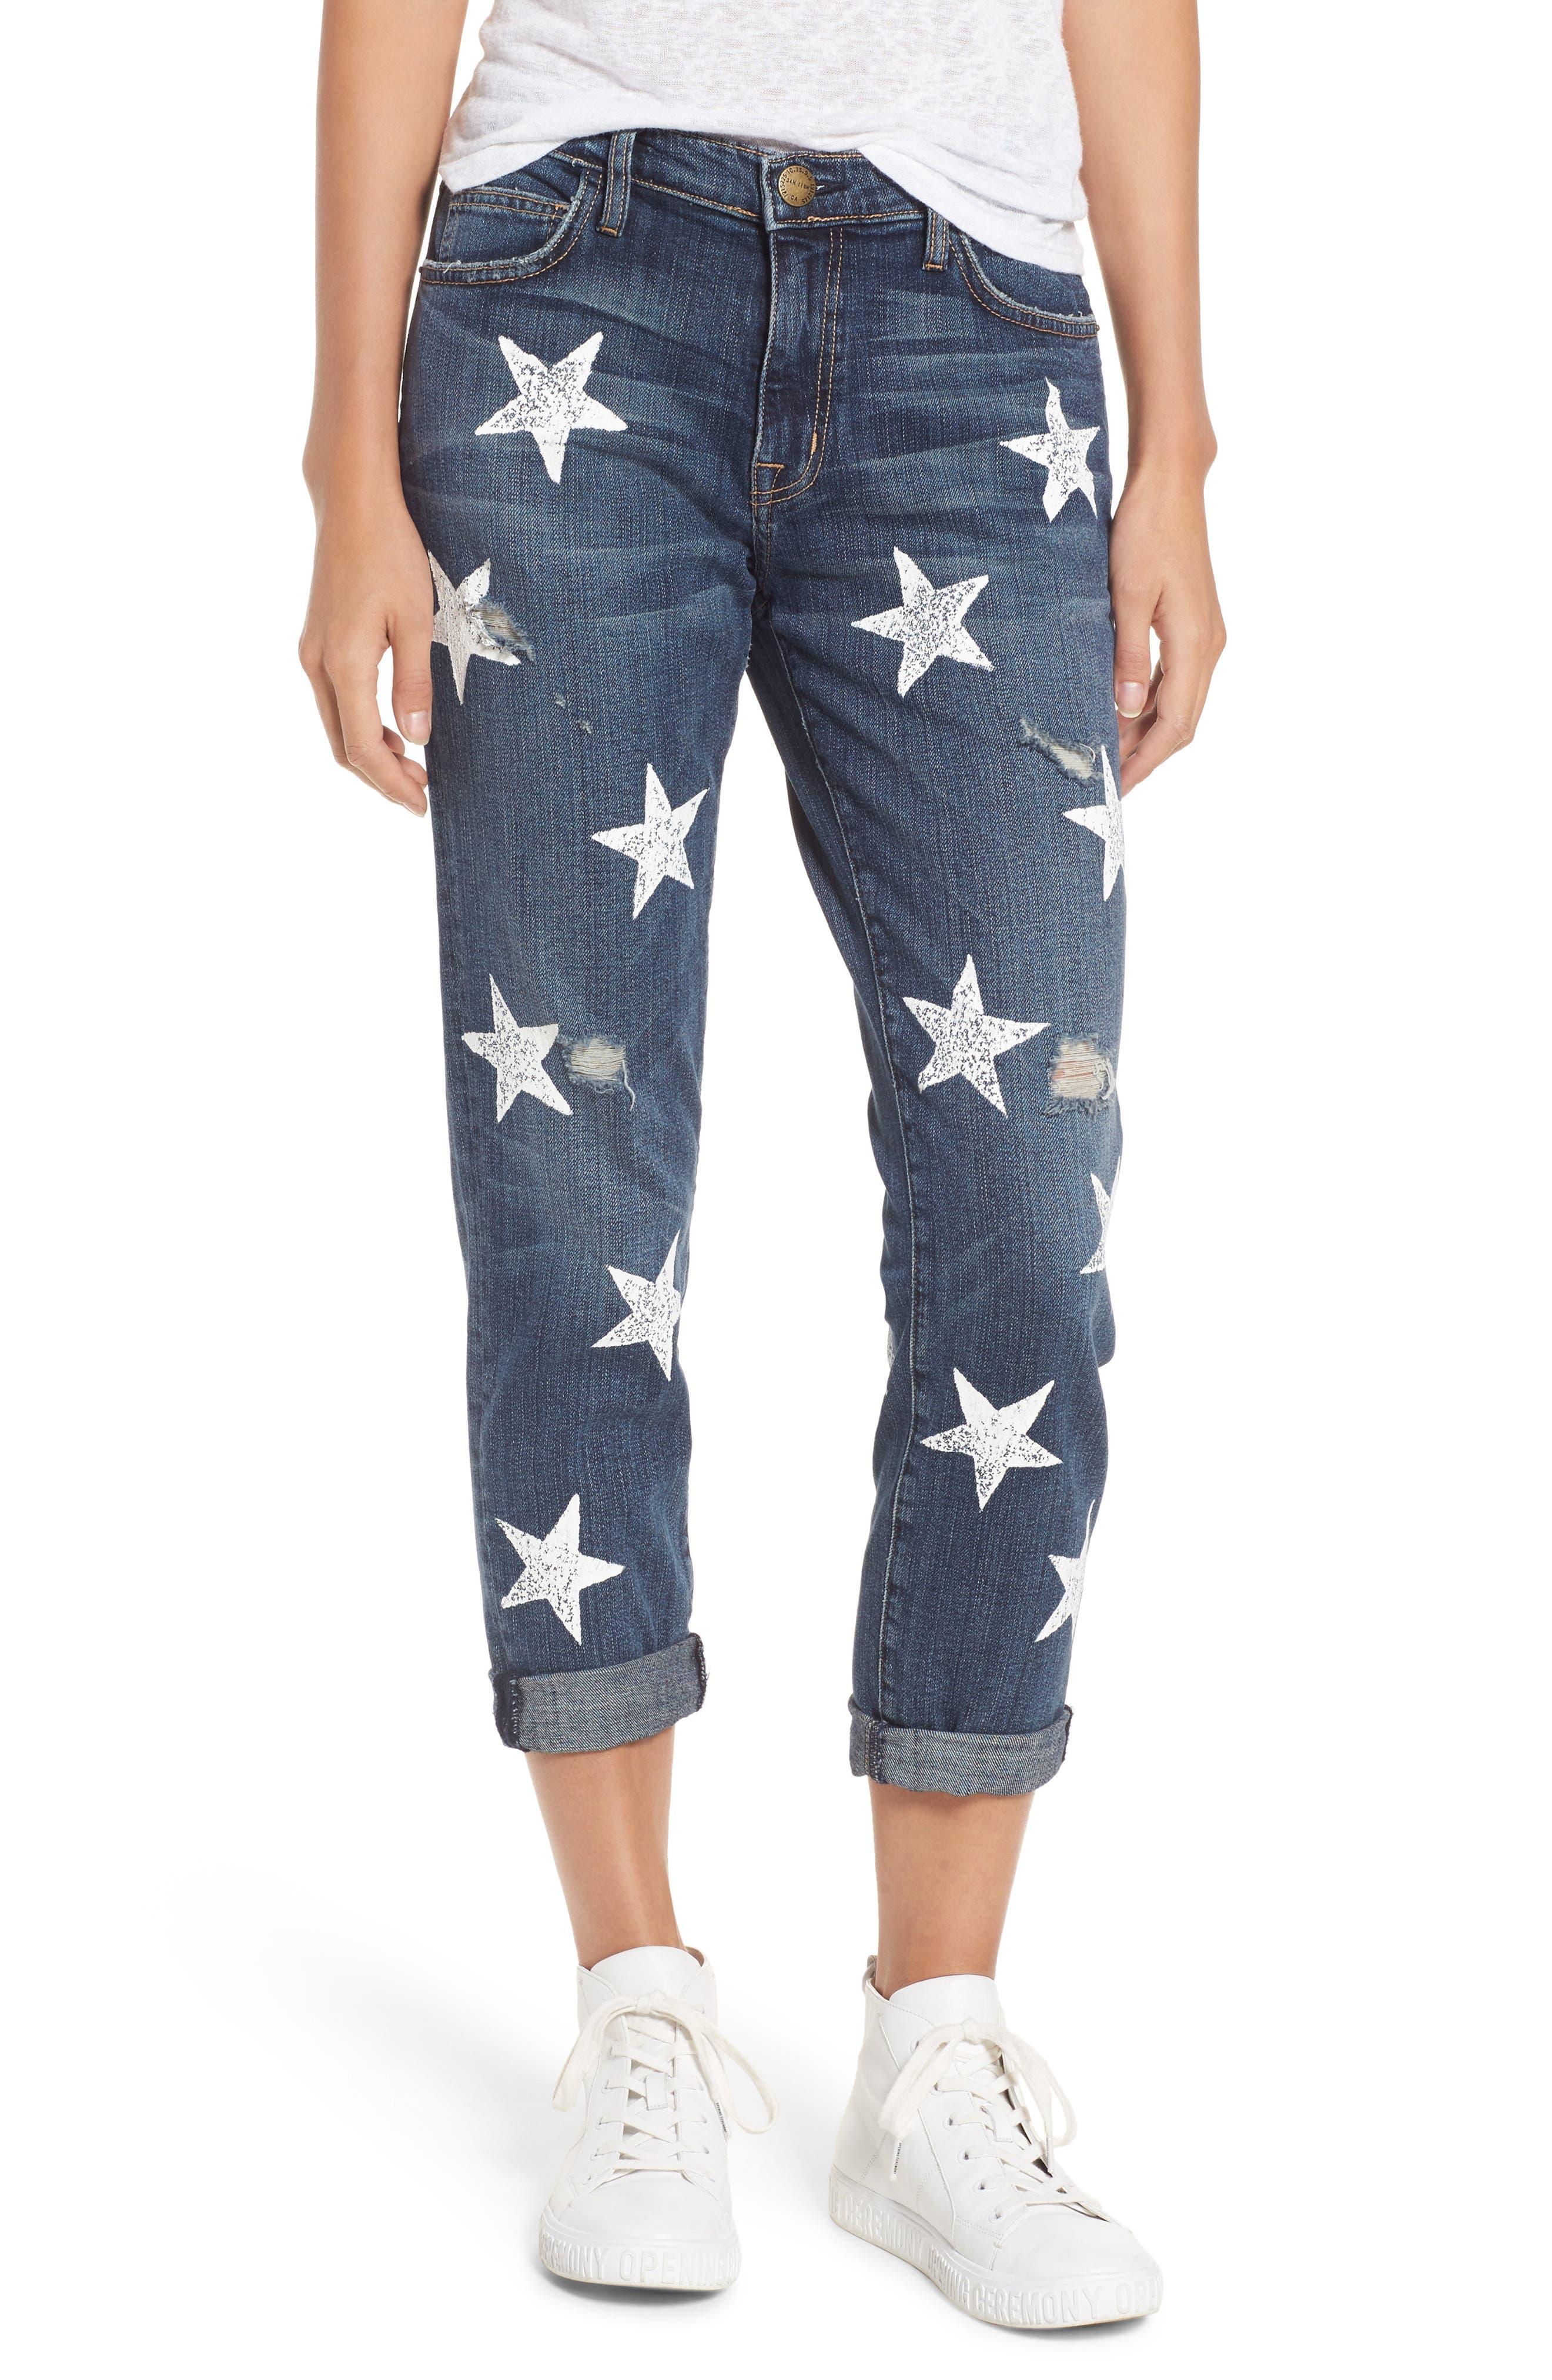 The Fling High Waist Boyfriend Jeans,                         Main,                         color, Loved Destroy/ White Stars